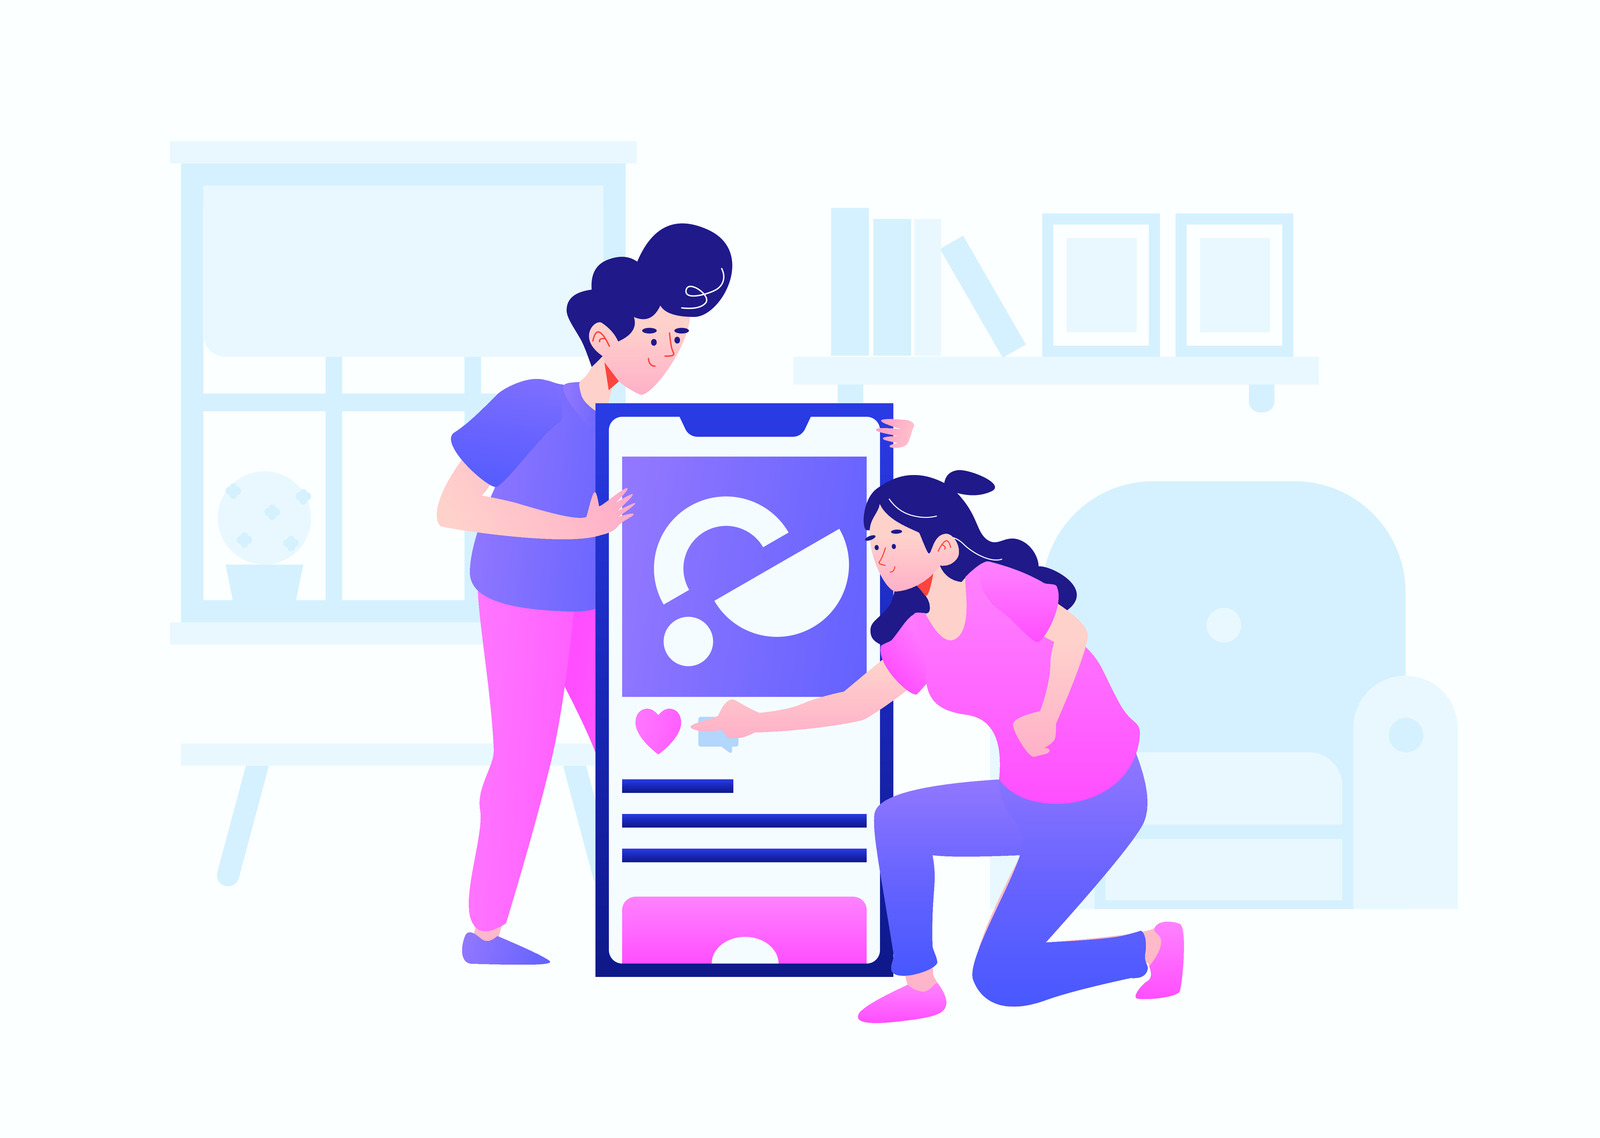 Startup mobile app